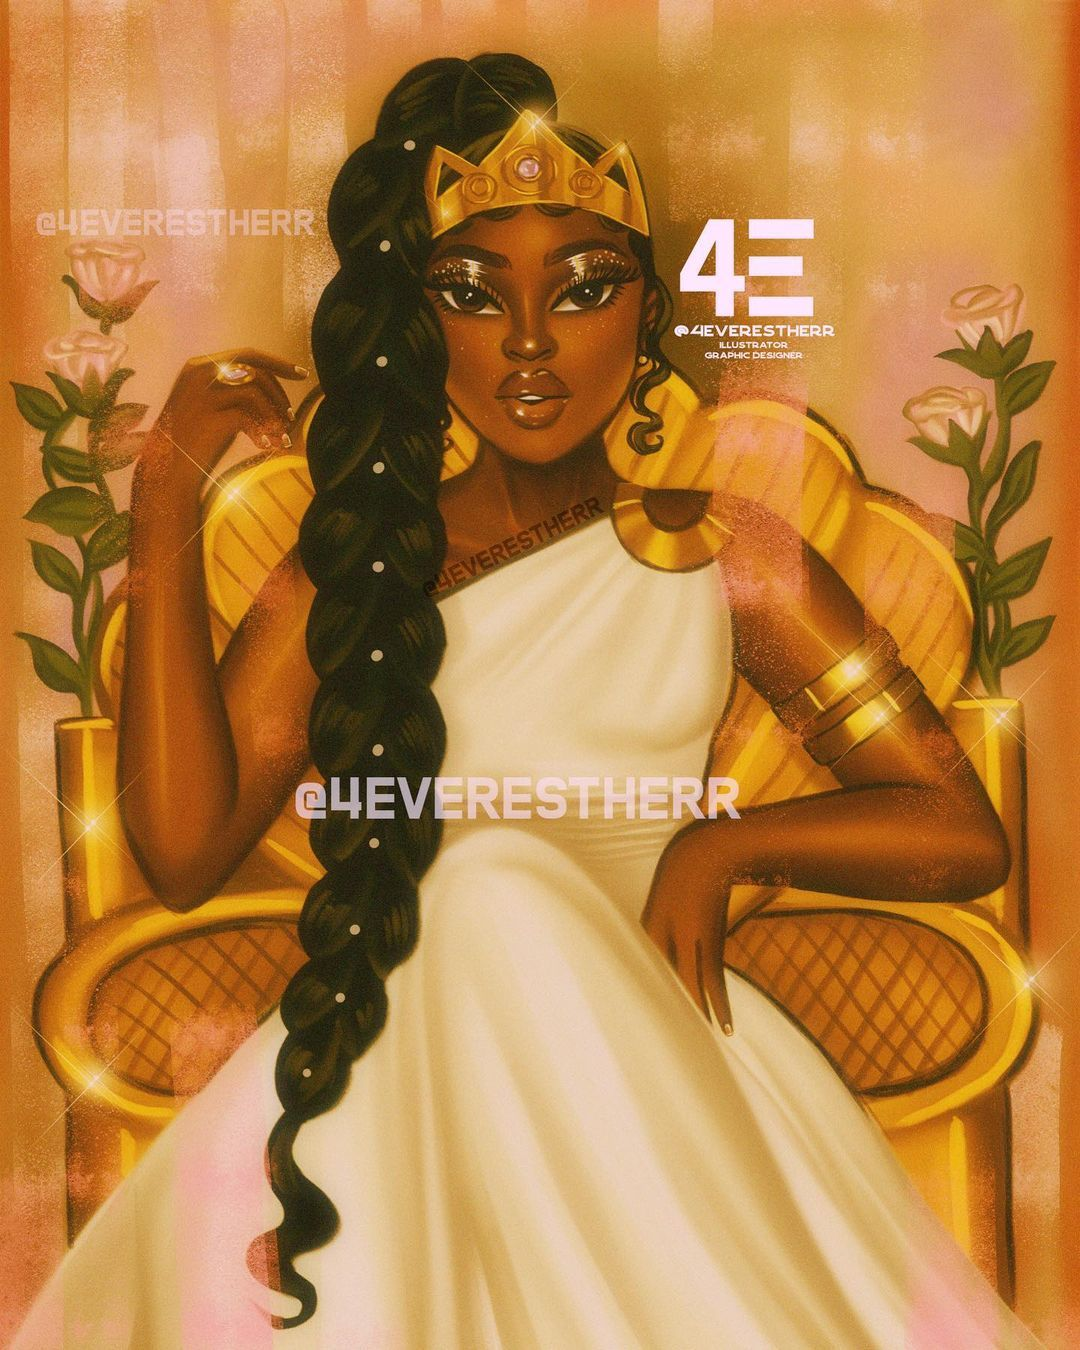 Estherr La Main D Or On Instagram Queenin Know Your Worth Then Add Tax Illu In 2021 Drawings Of Black Girls Black Girl Cartoon Black Love Art